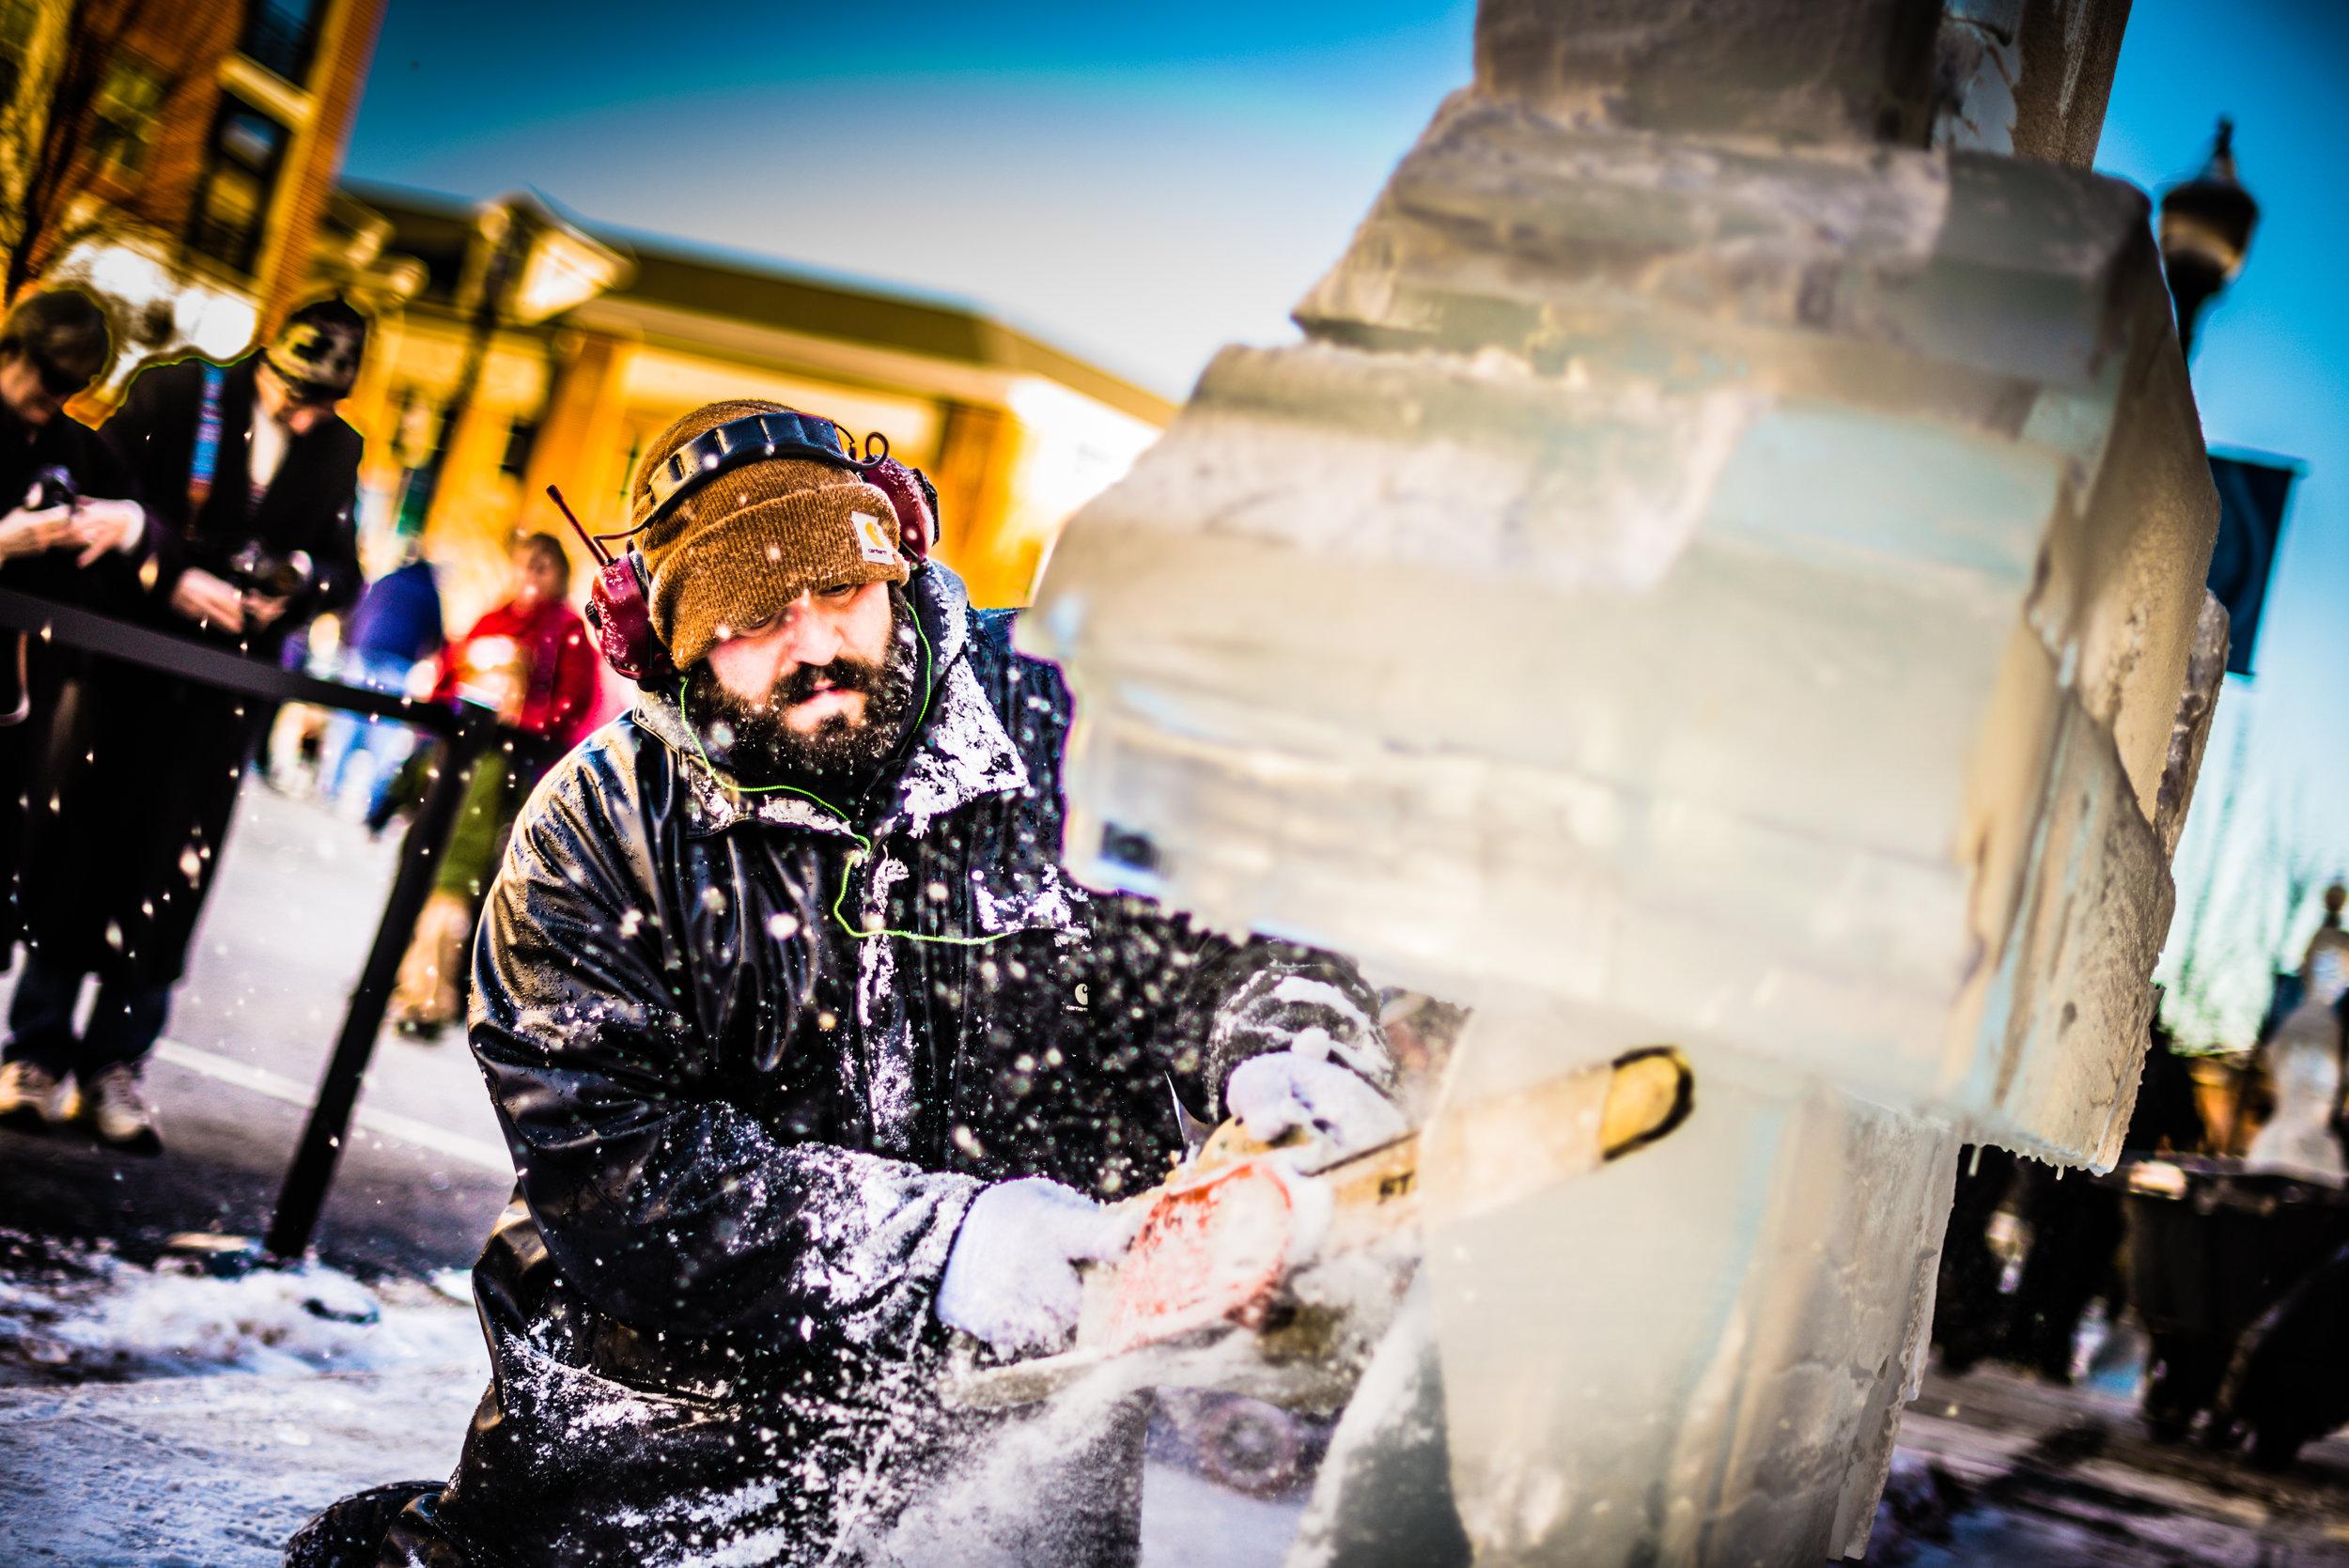 icecarvwet-29.jpg